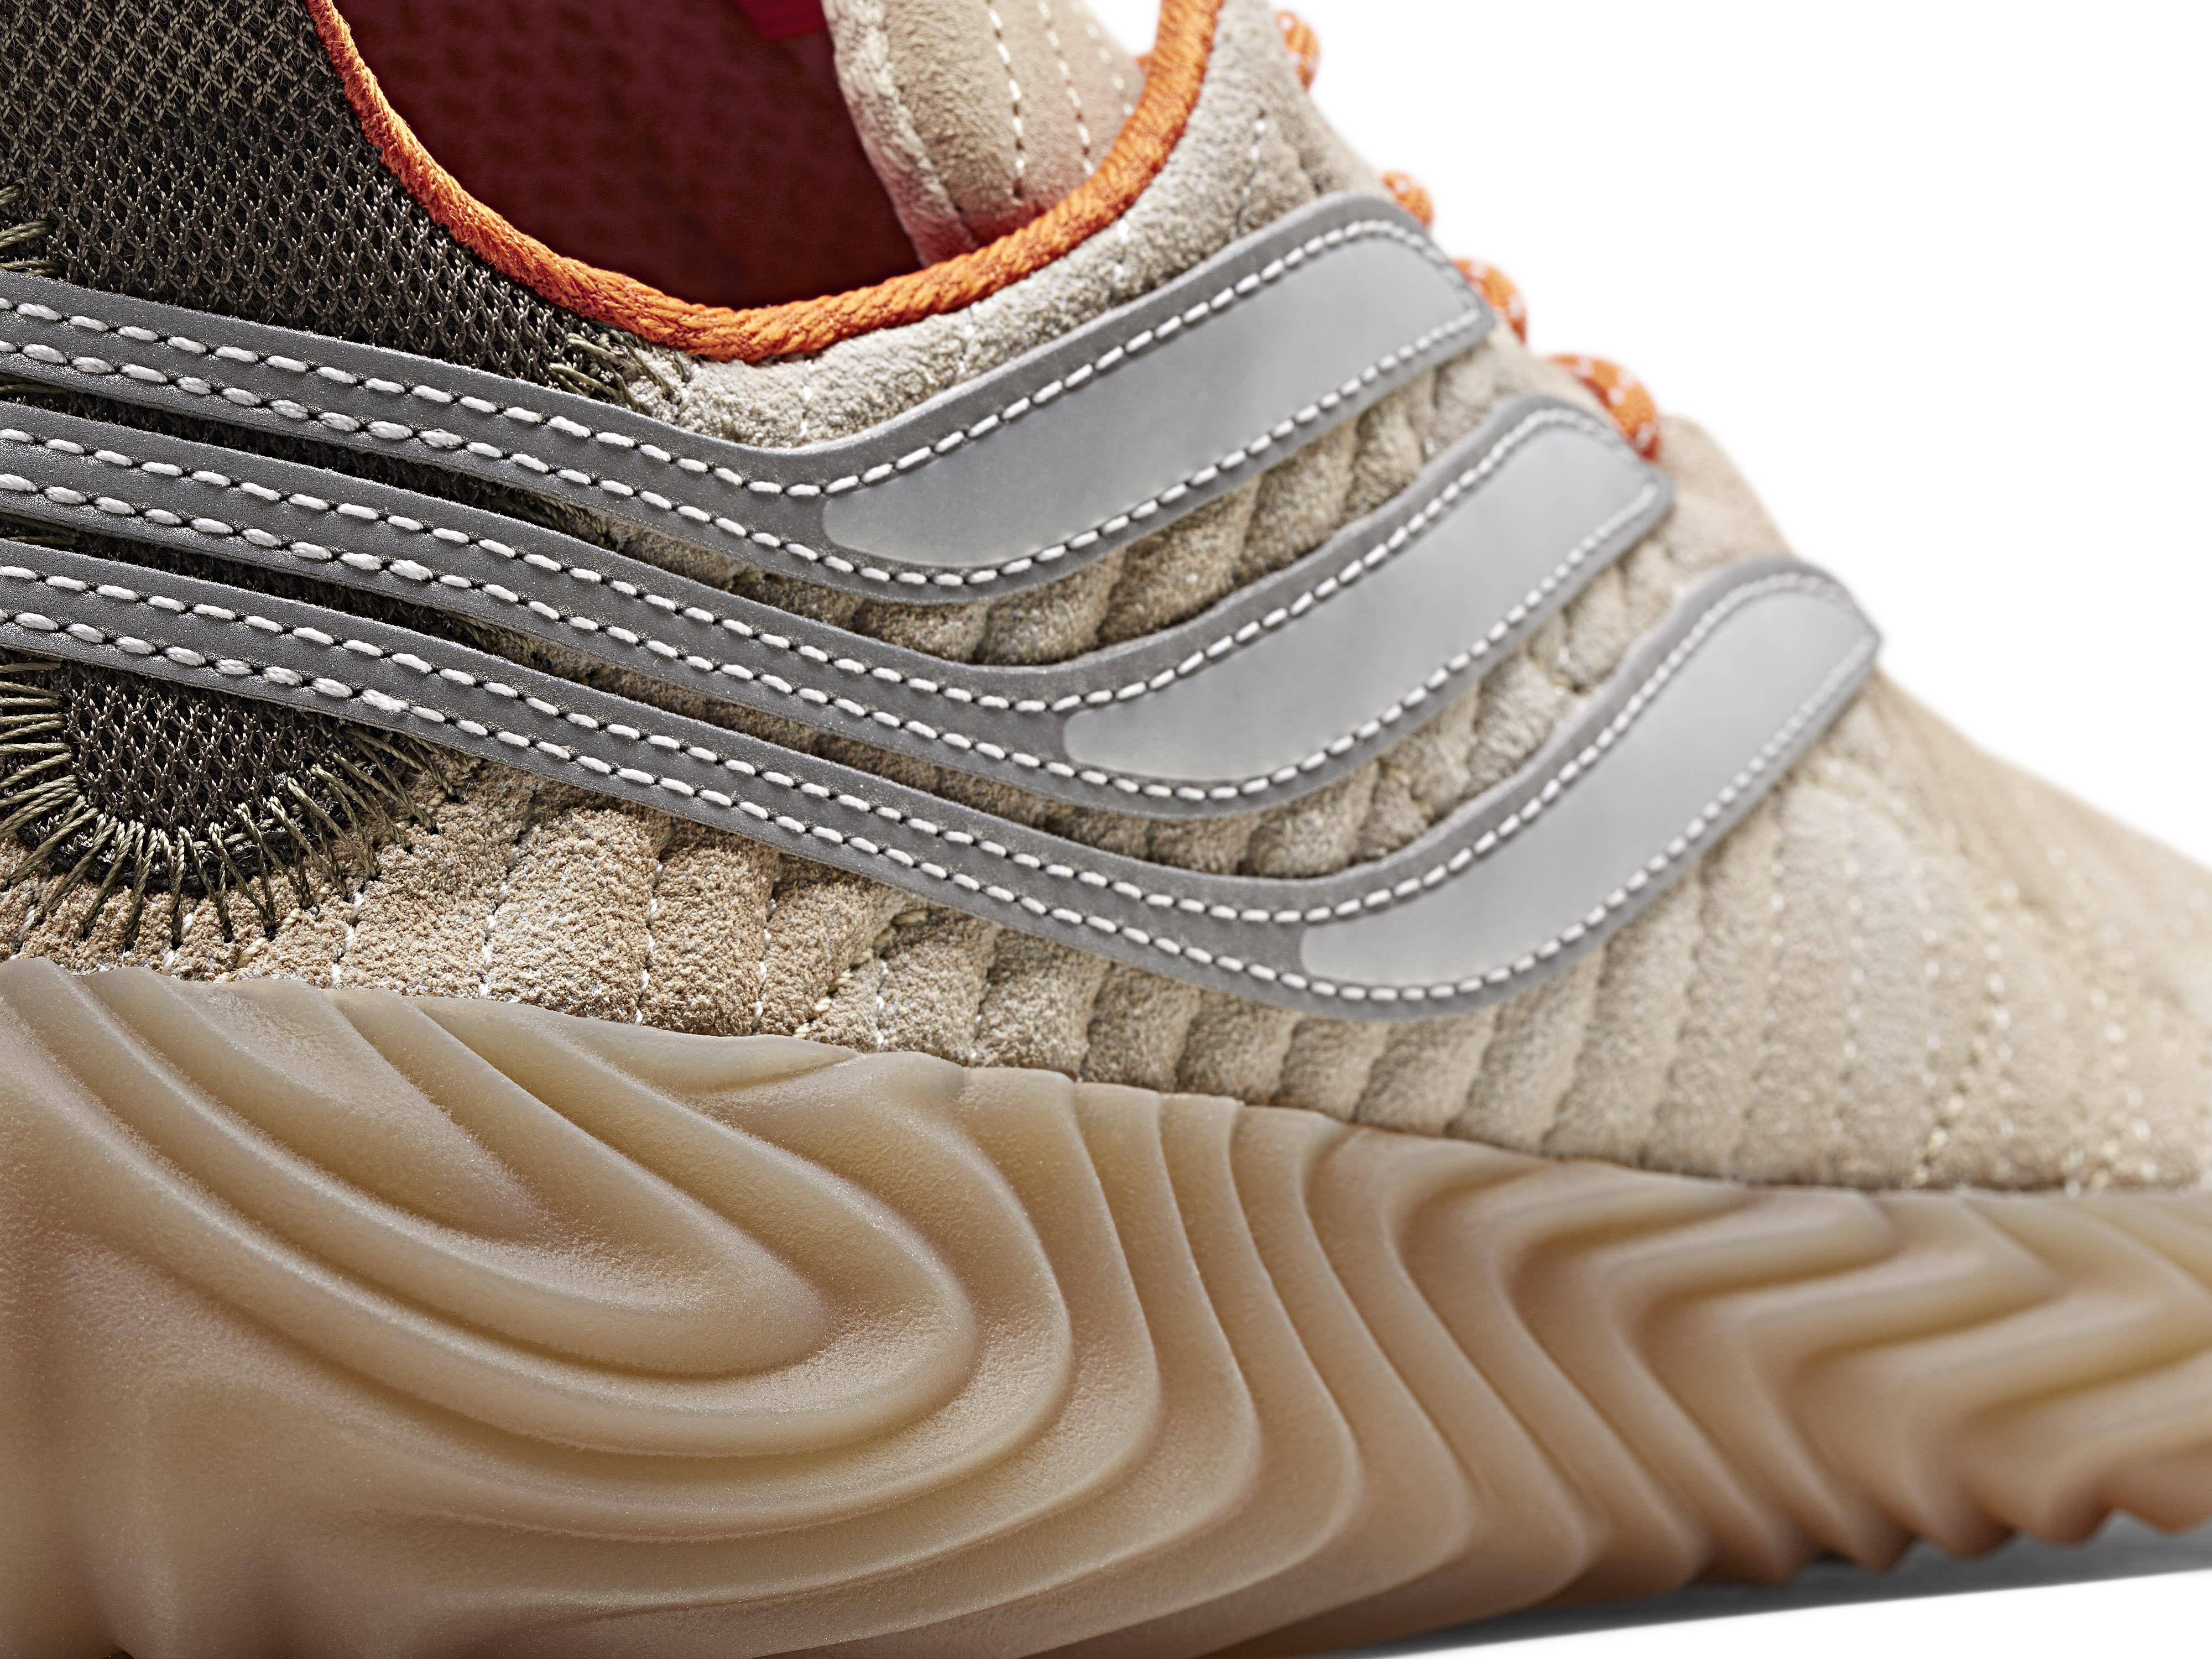 Bodega x Adidas Sobakov BC0818 (Detail)